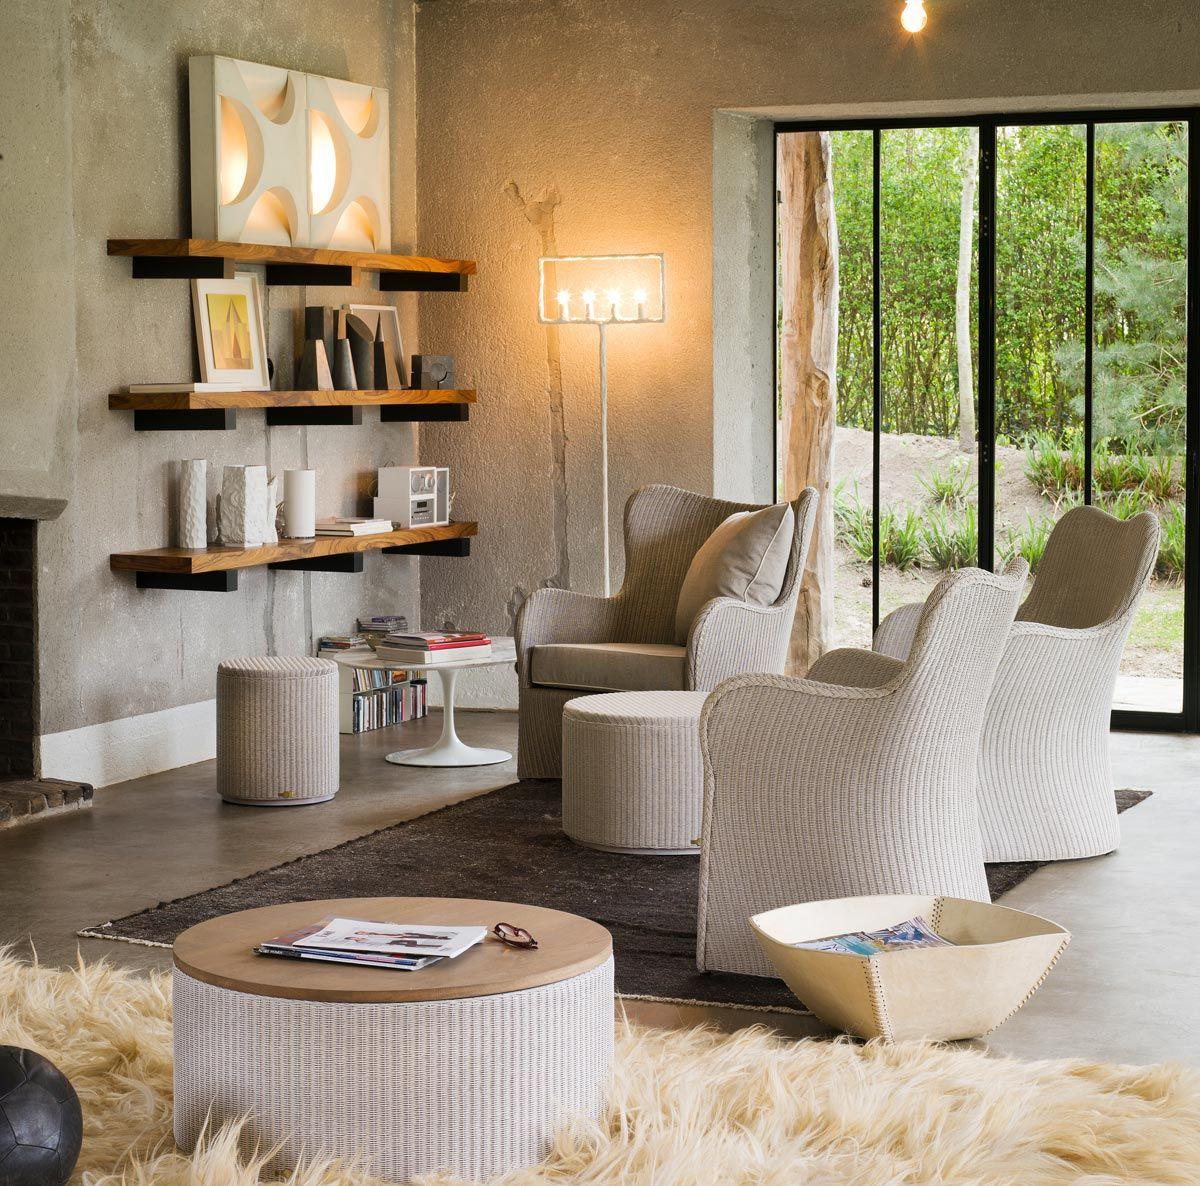 amougies meubles amiami meubles en belgique selection. Black Bedroom Furniture Sets. Home Design Ideas